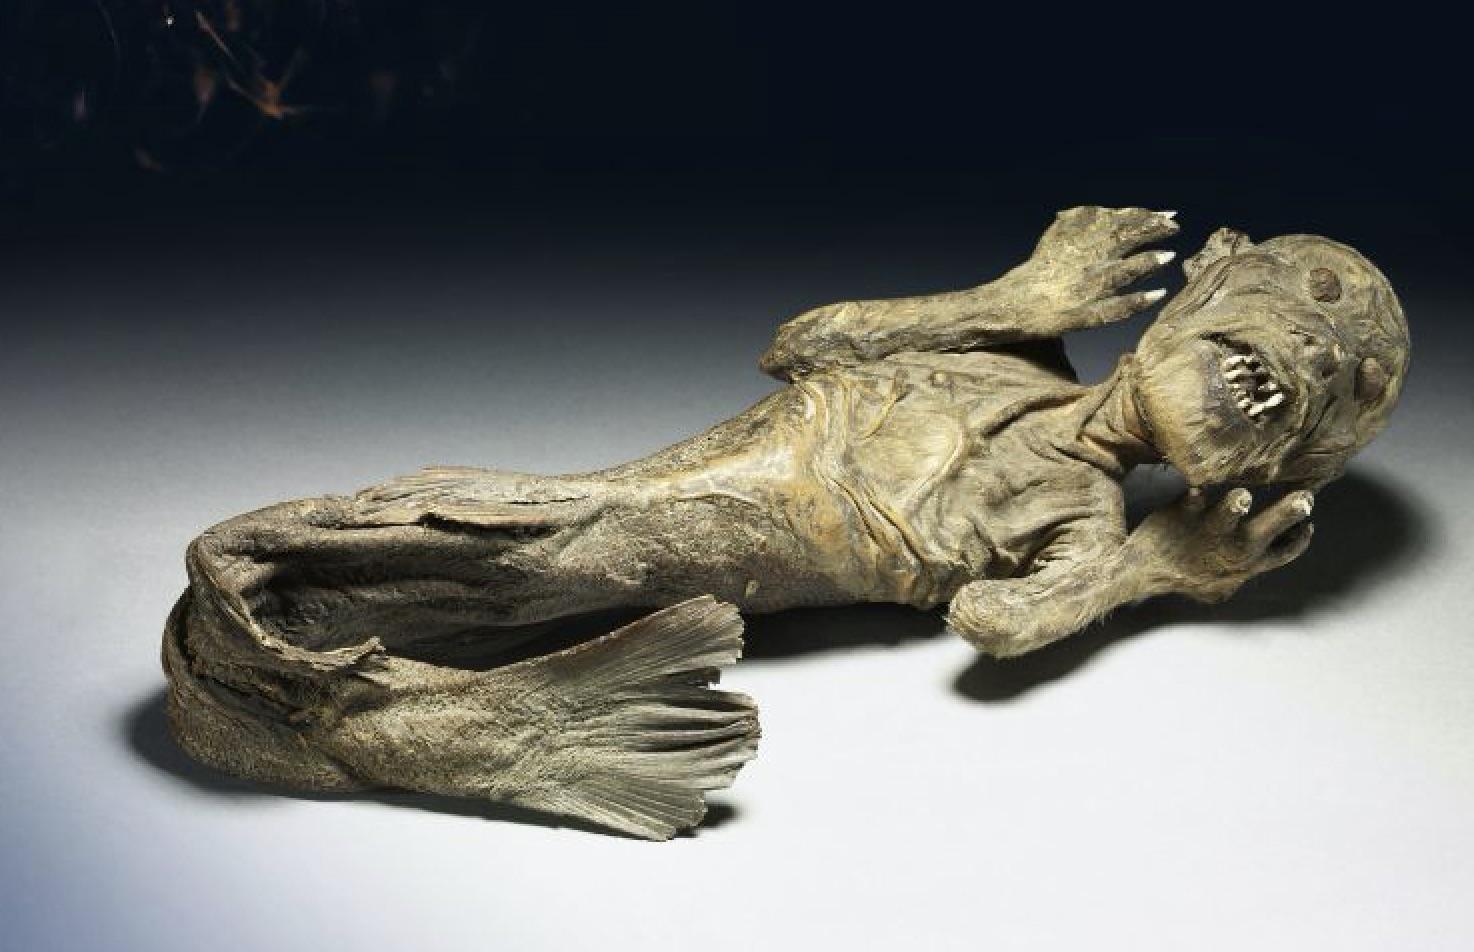 Mermaid (Trustees of the British Museum, EH)